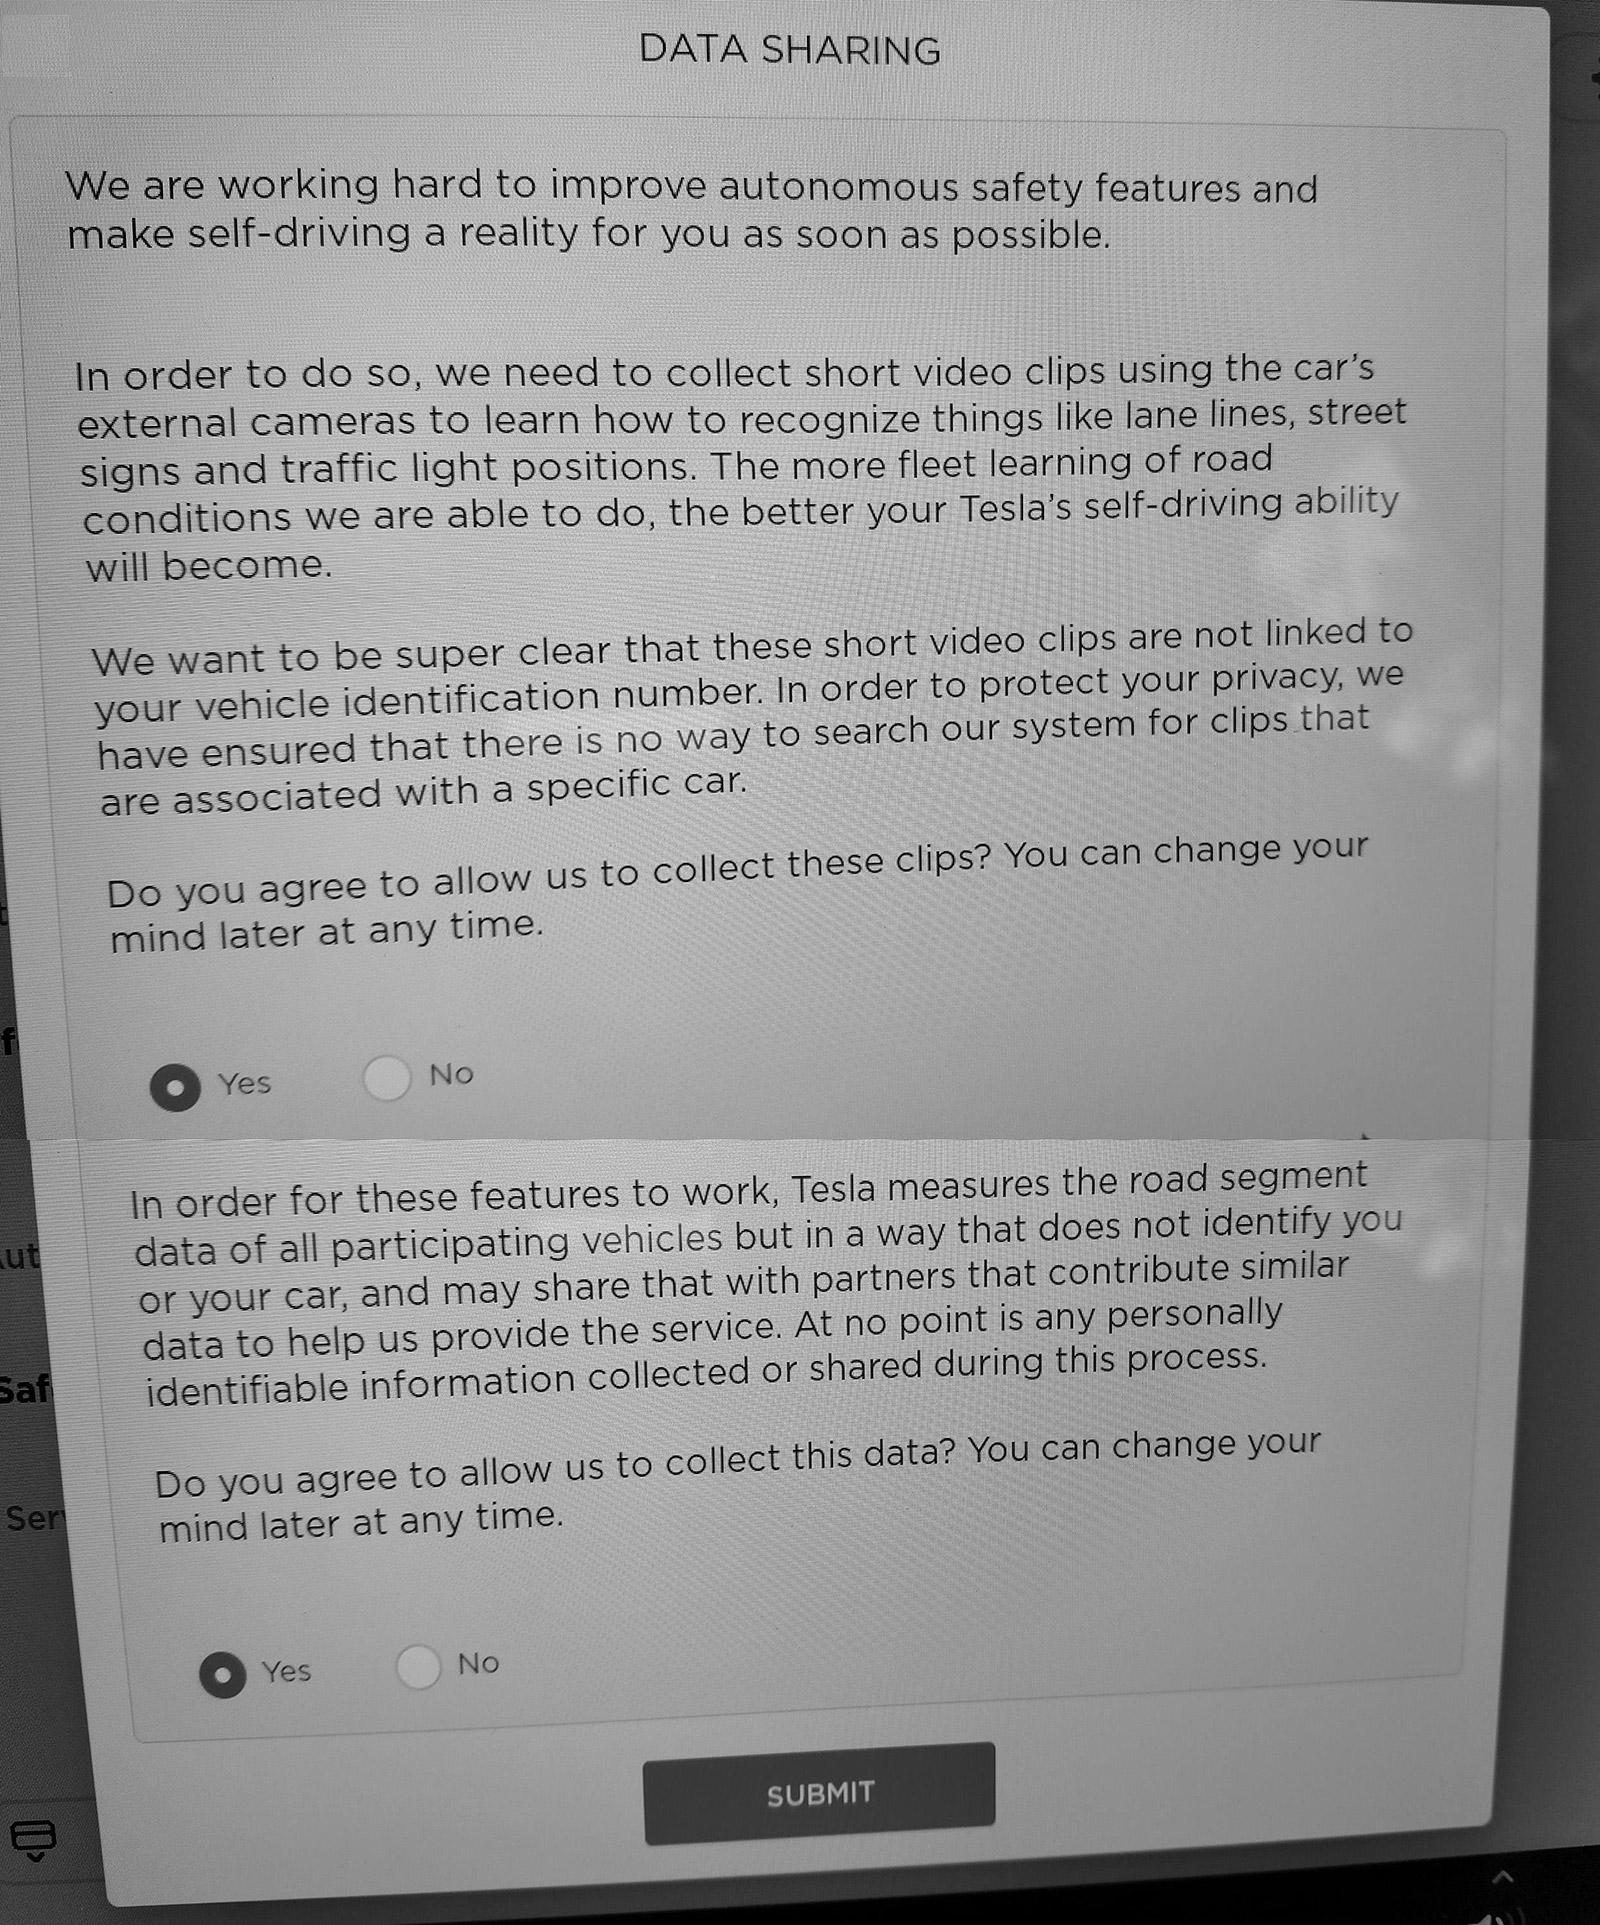 Tesla Autopilot video clip sharing opt-in/out dialogue box screenshot.